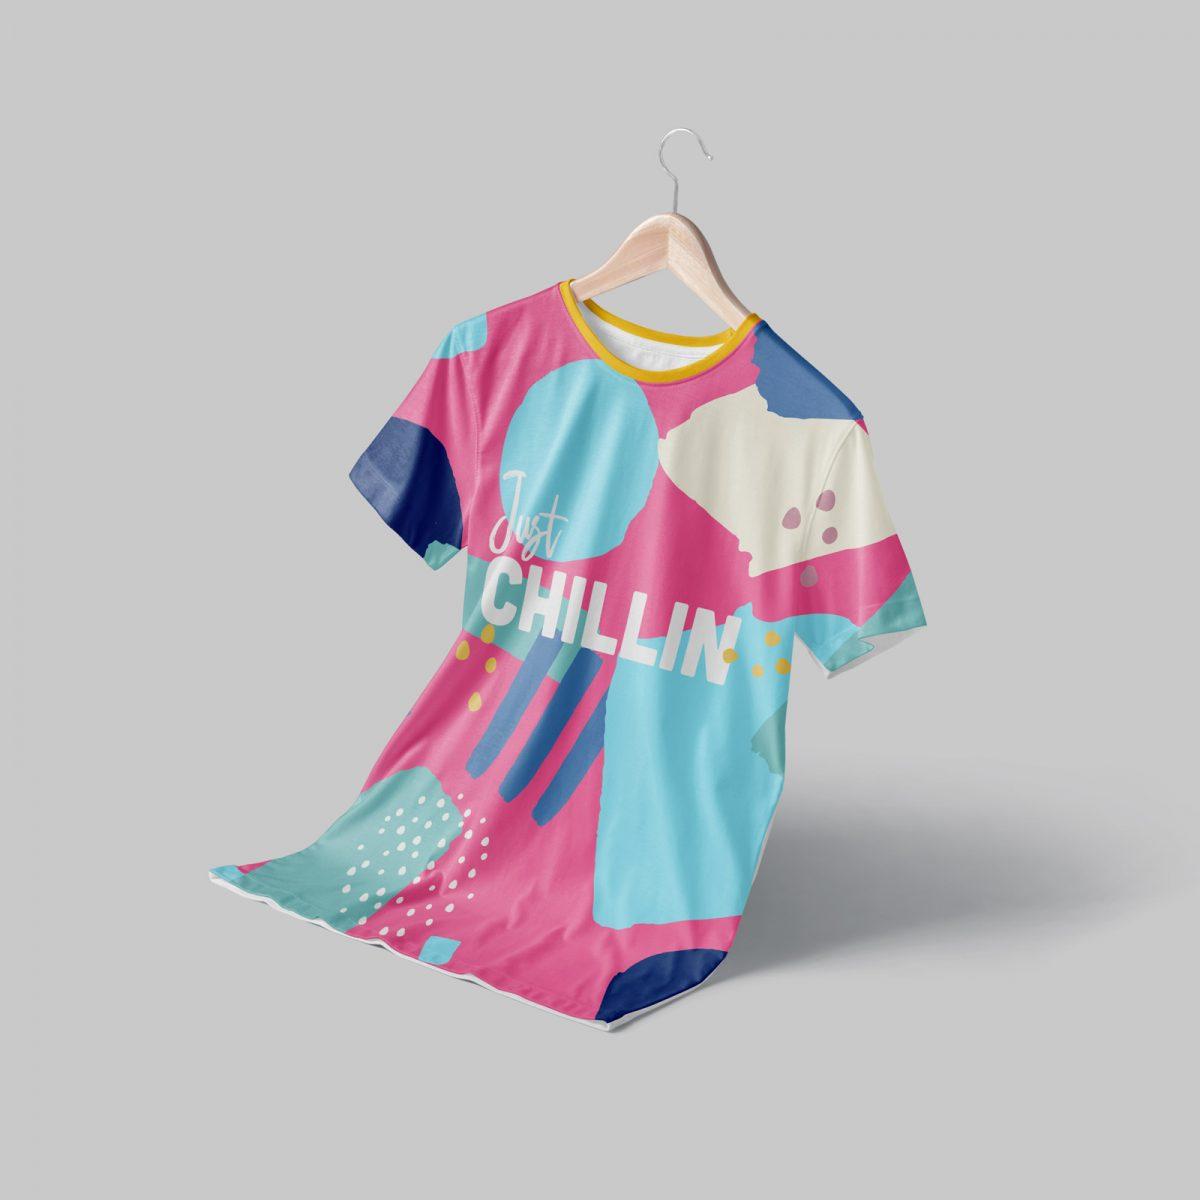 t-shirt-design-by-jb-design-studio-just-chillin